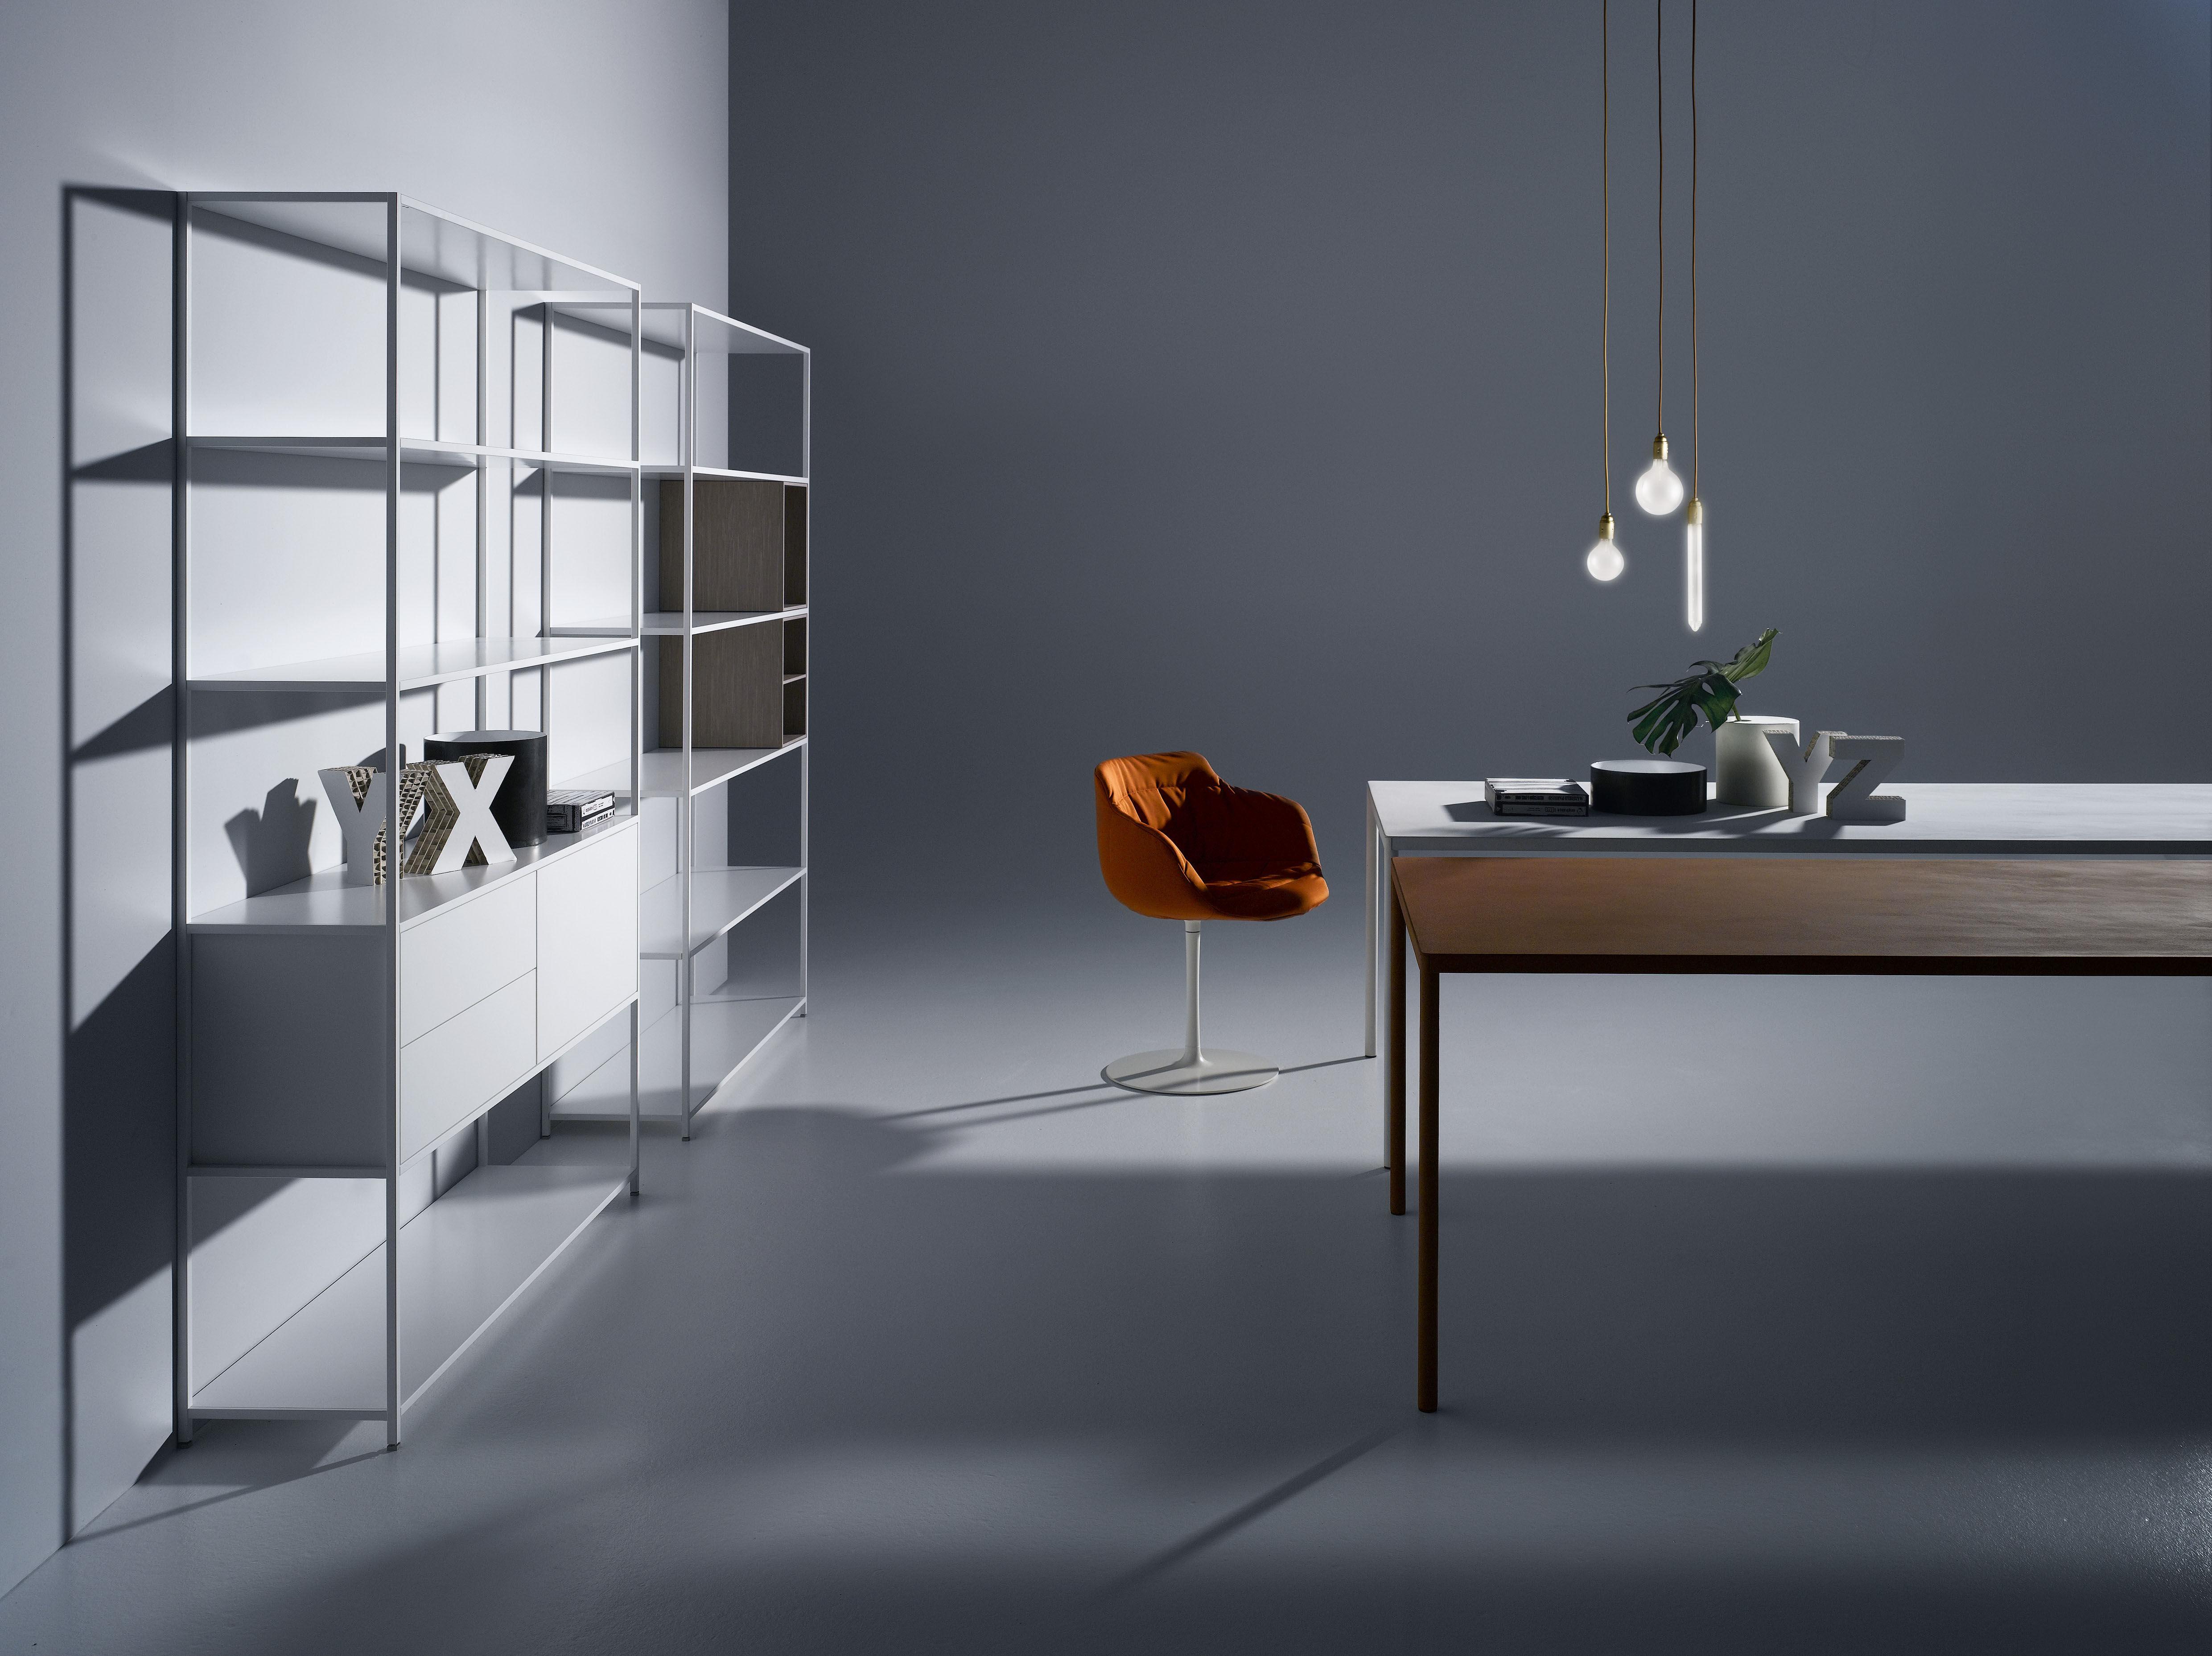 table robin ciment 200 x 90 cm ciment blanc chaux mdf italia. Black Bedroom Furniture Sets. Home Design Ideas